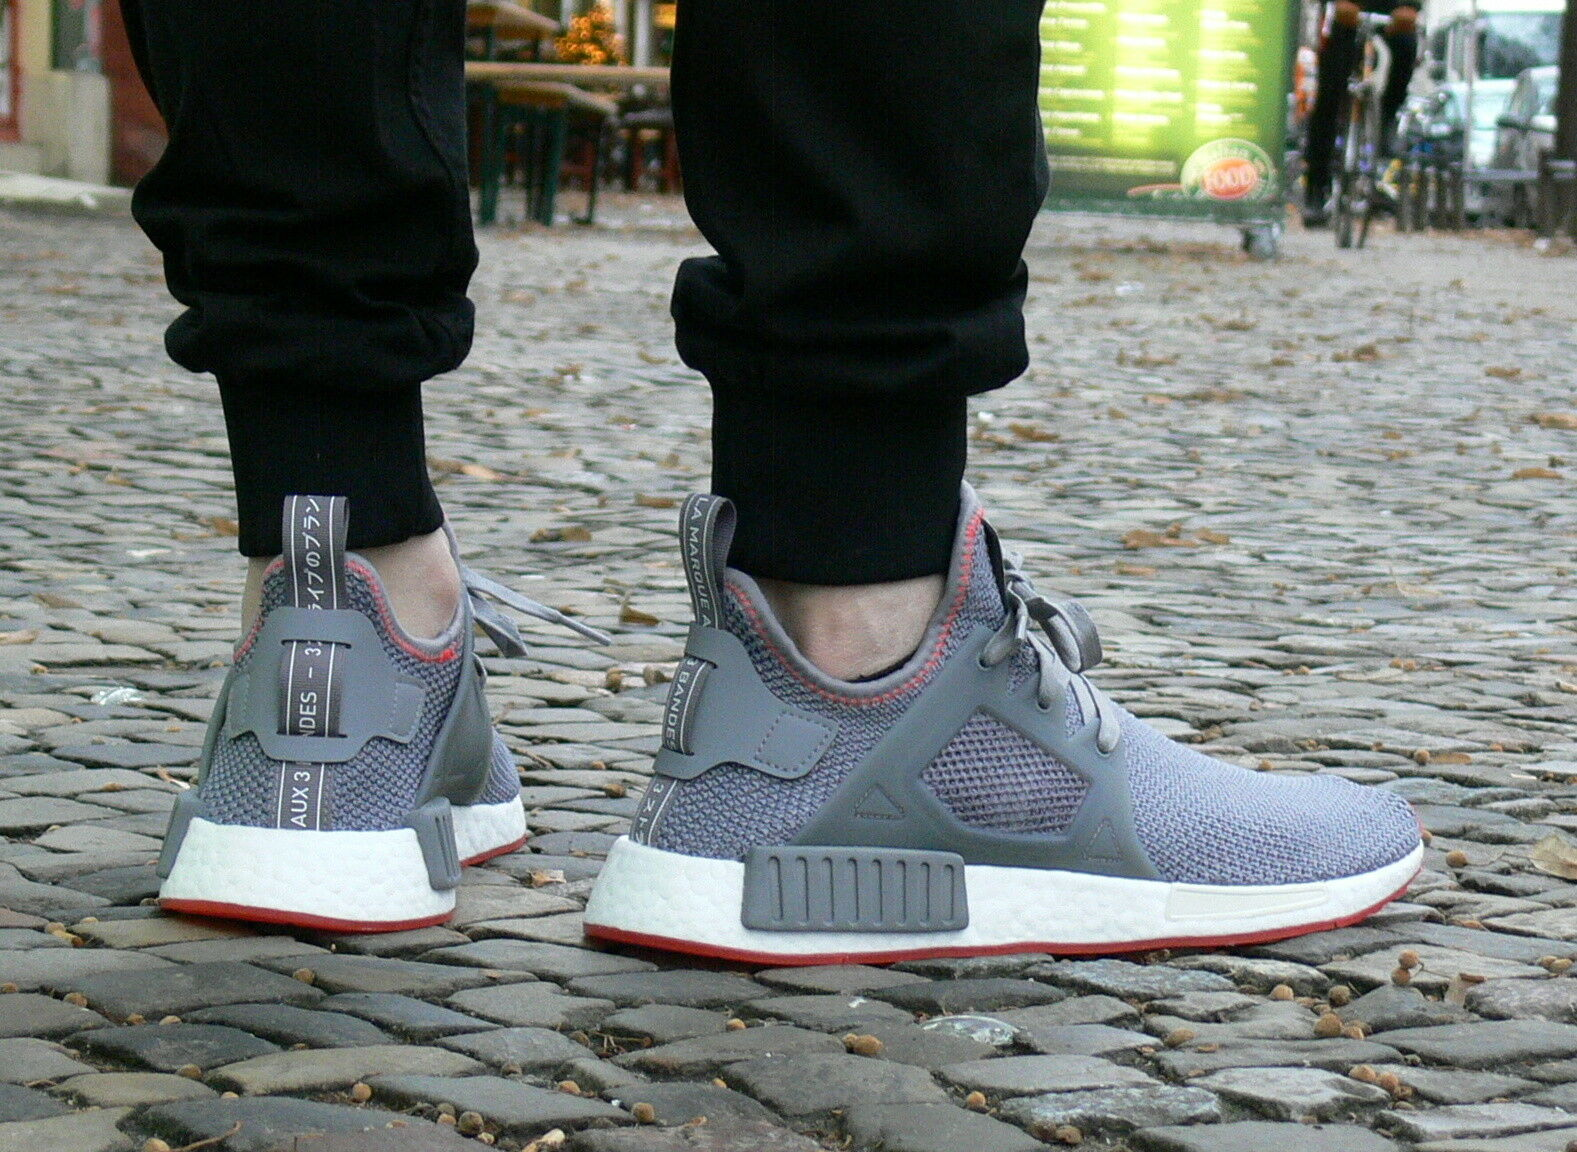 Adidas NMD_XR1 Primeknit Schuh BY9925 Core grau grau grau Grau Turnschuh BOOST Sohle NEU eae57d